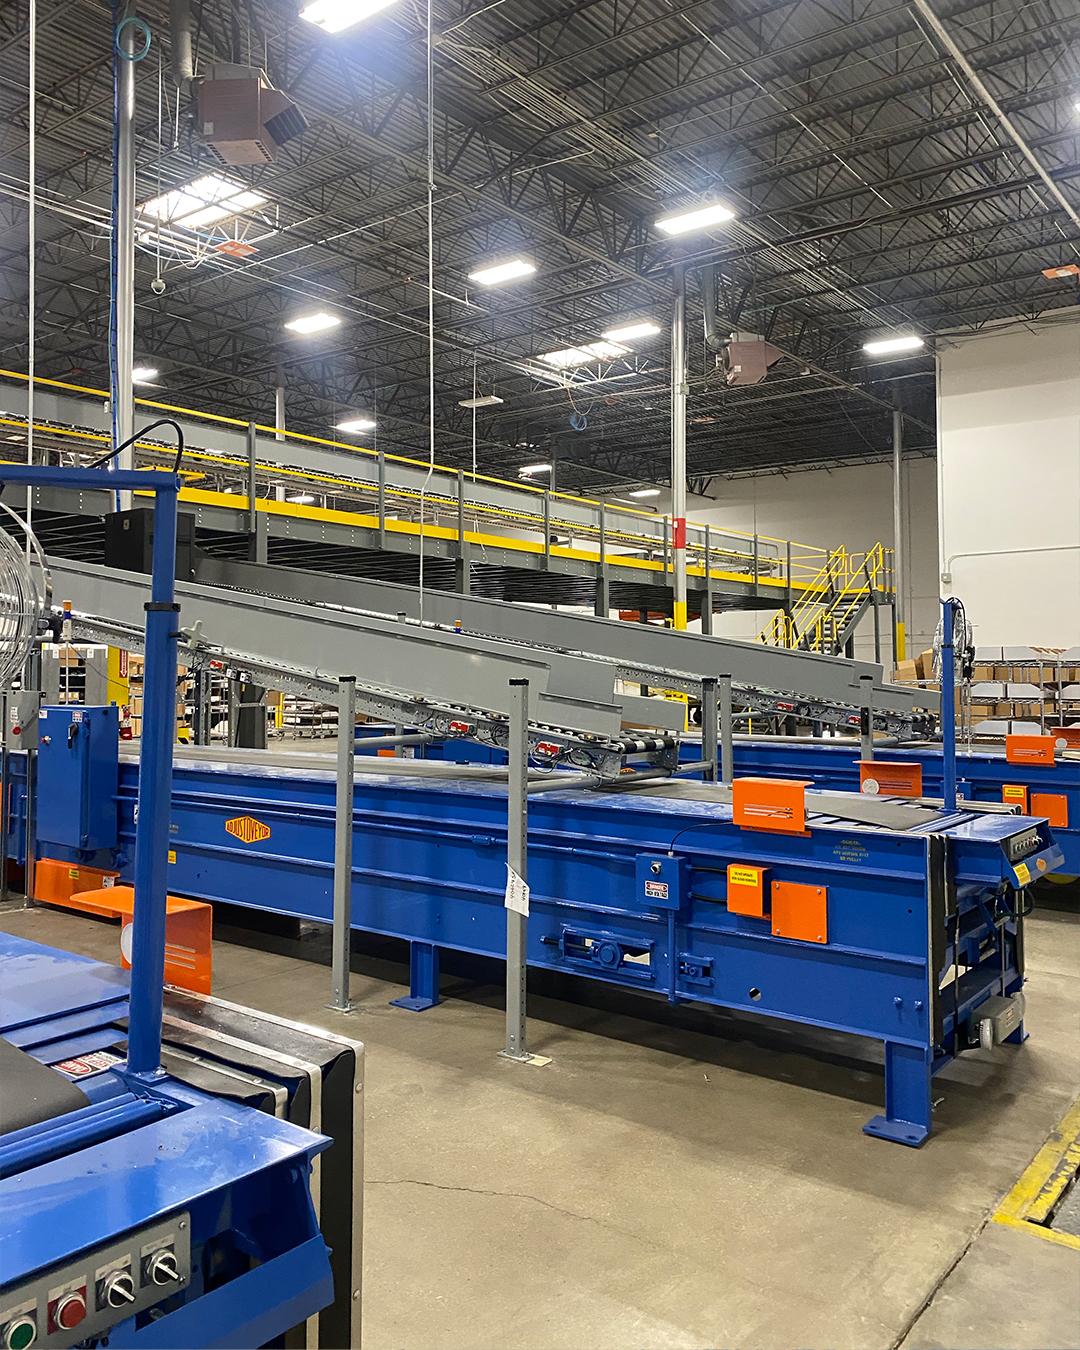 The end of a long, blue conveyer belt